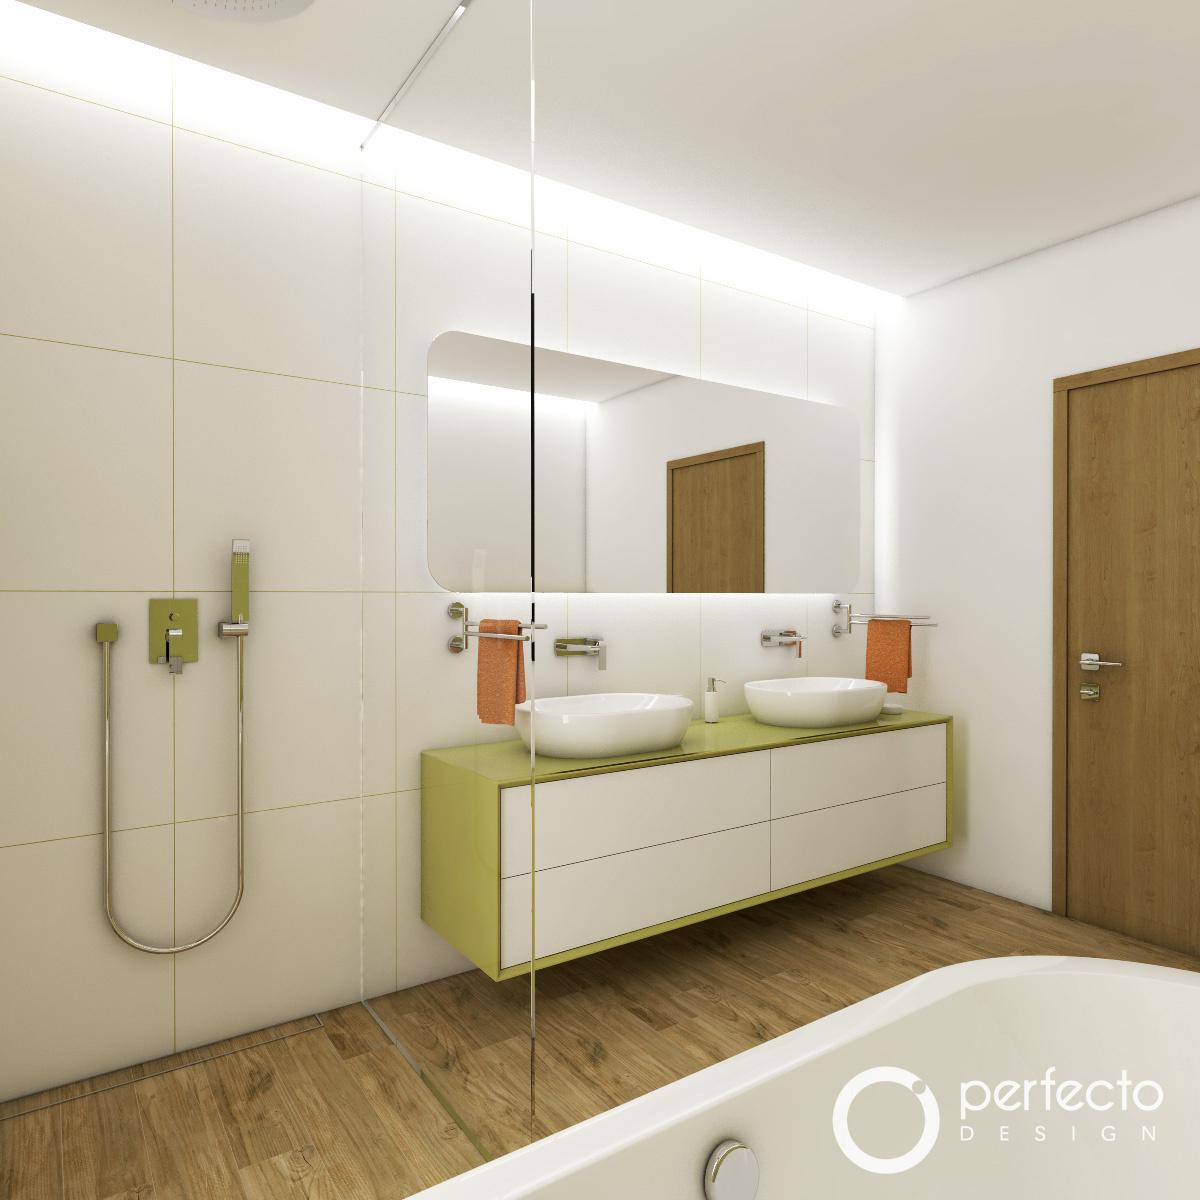 Badezimmer 6 M2 modernes badezimmer park perfecto design